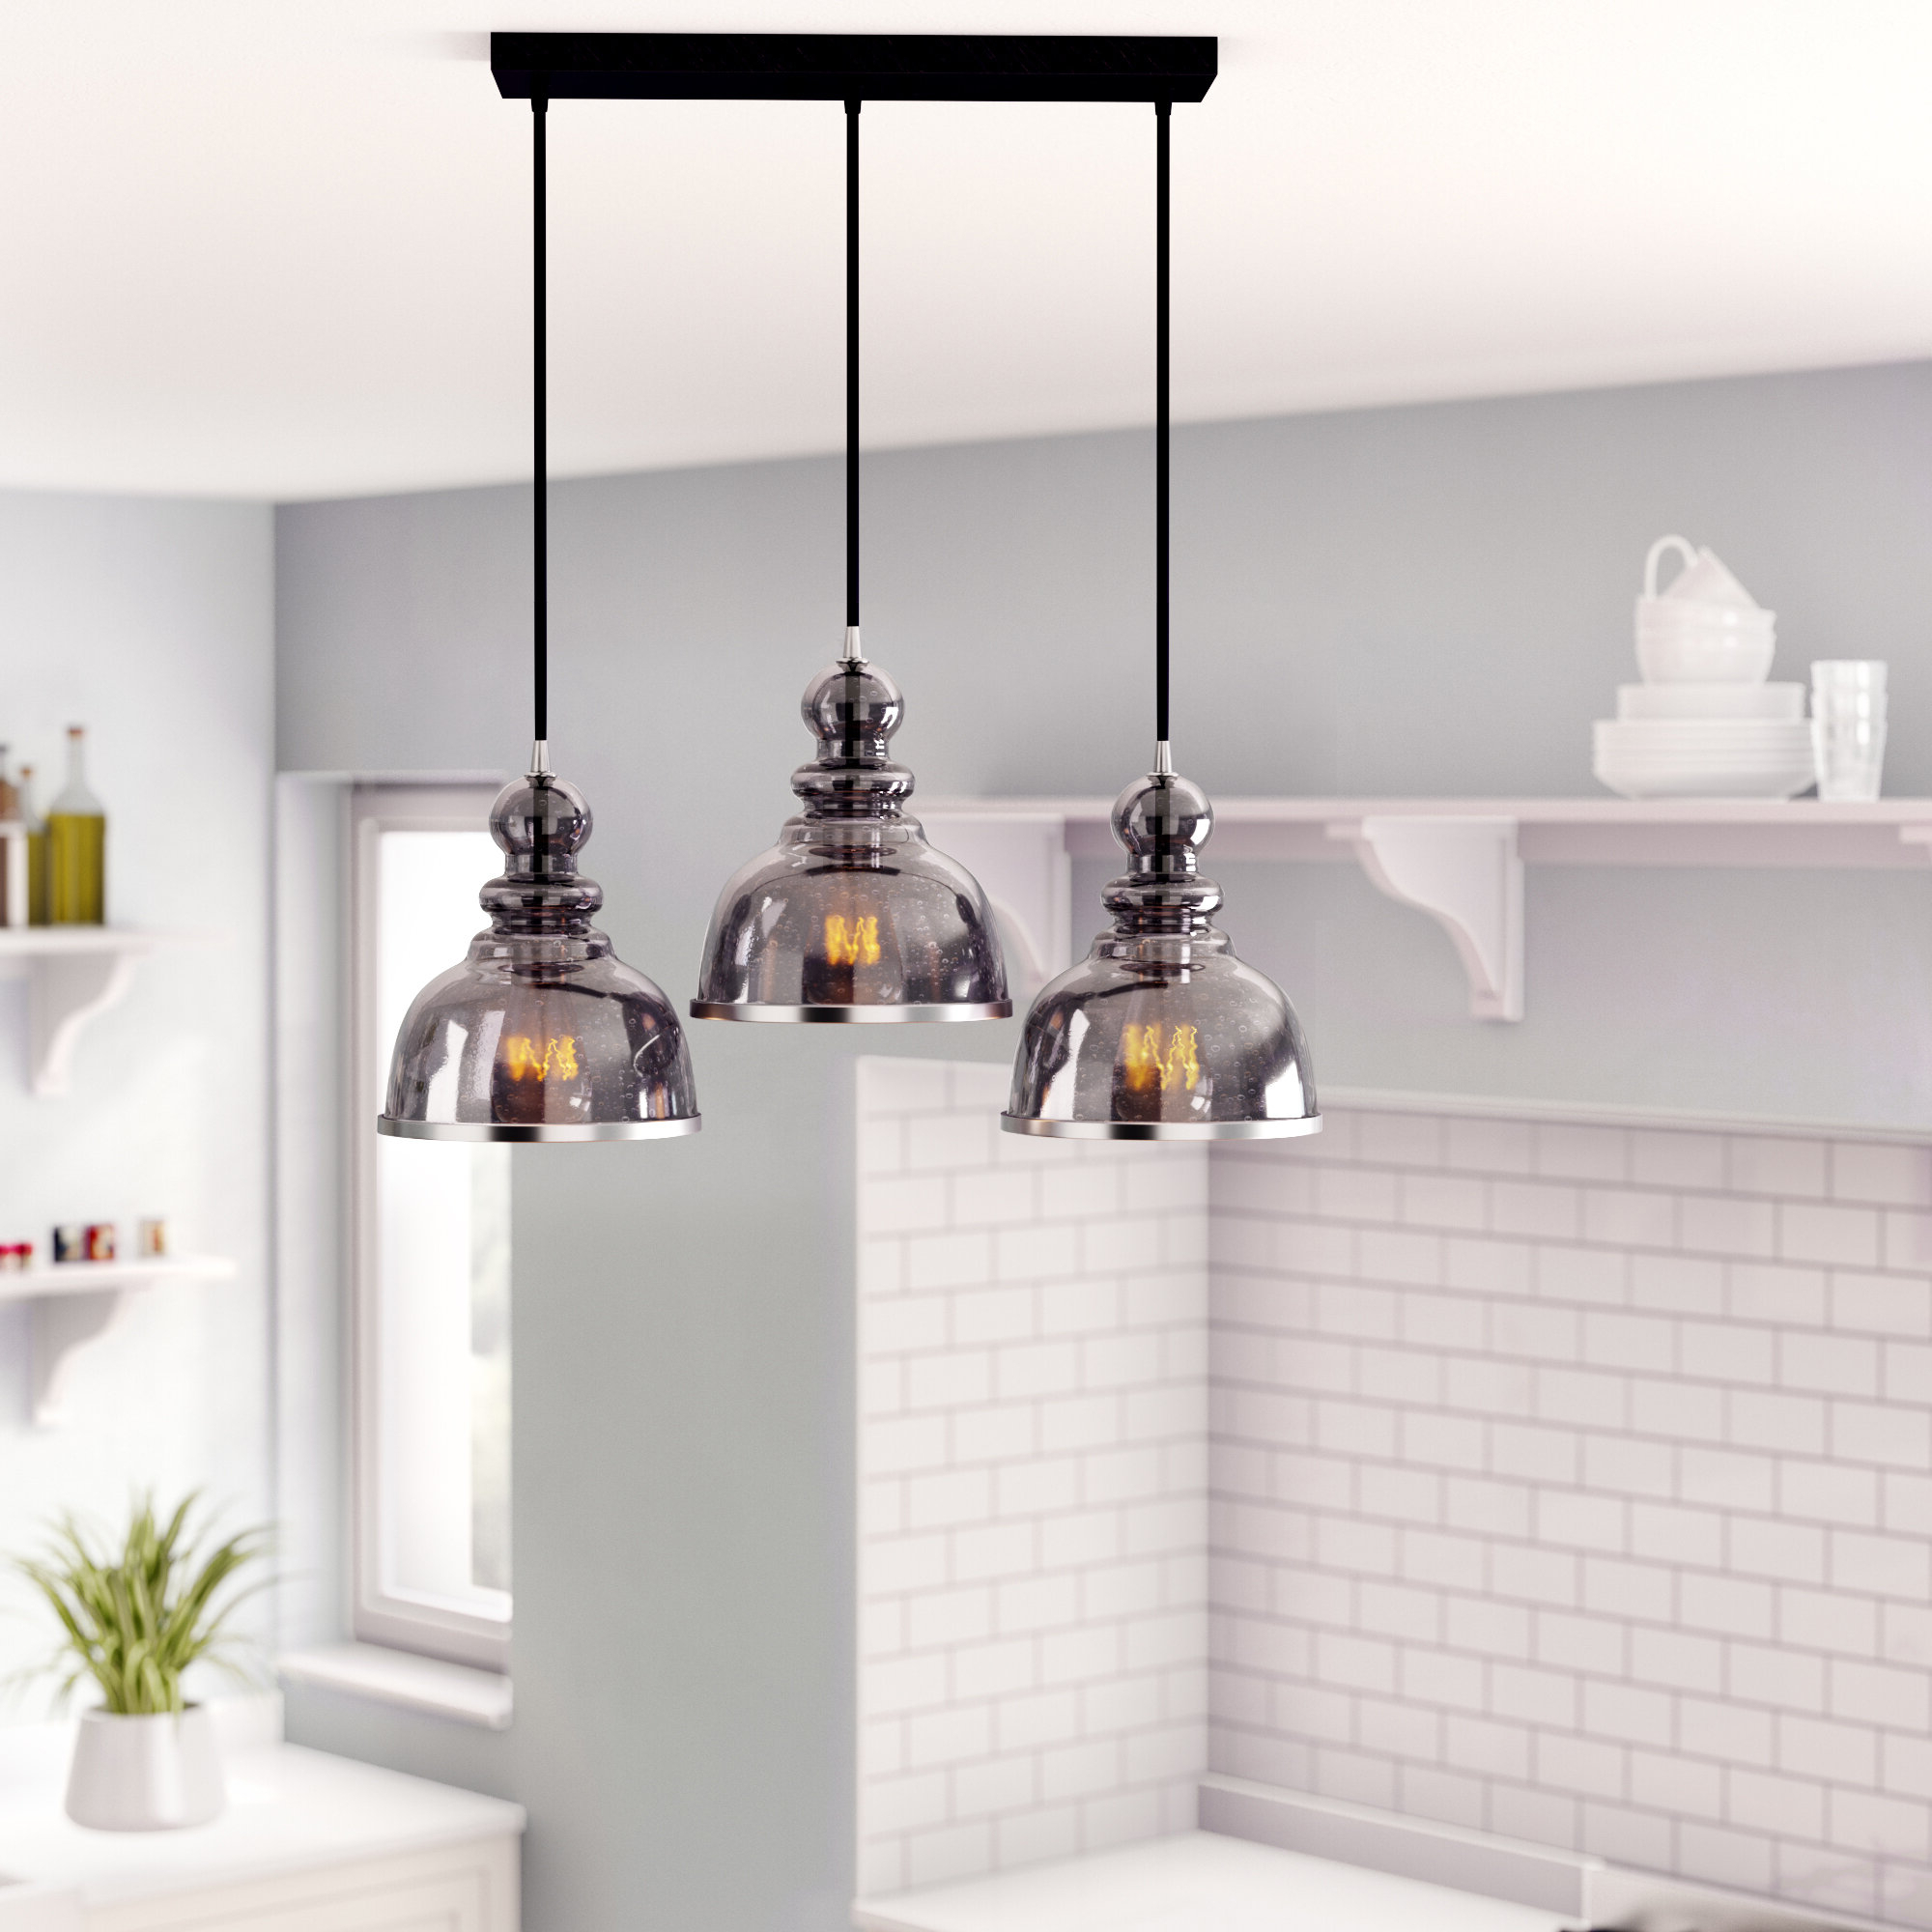 Humphries 3Light Kitchen Island Pendant Lighting Kitchen Pertaining To Newest Dunson 3 Light Kitchen Island Pendants (Gallery 4 of 25)